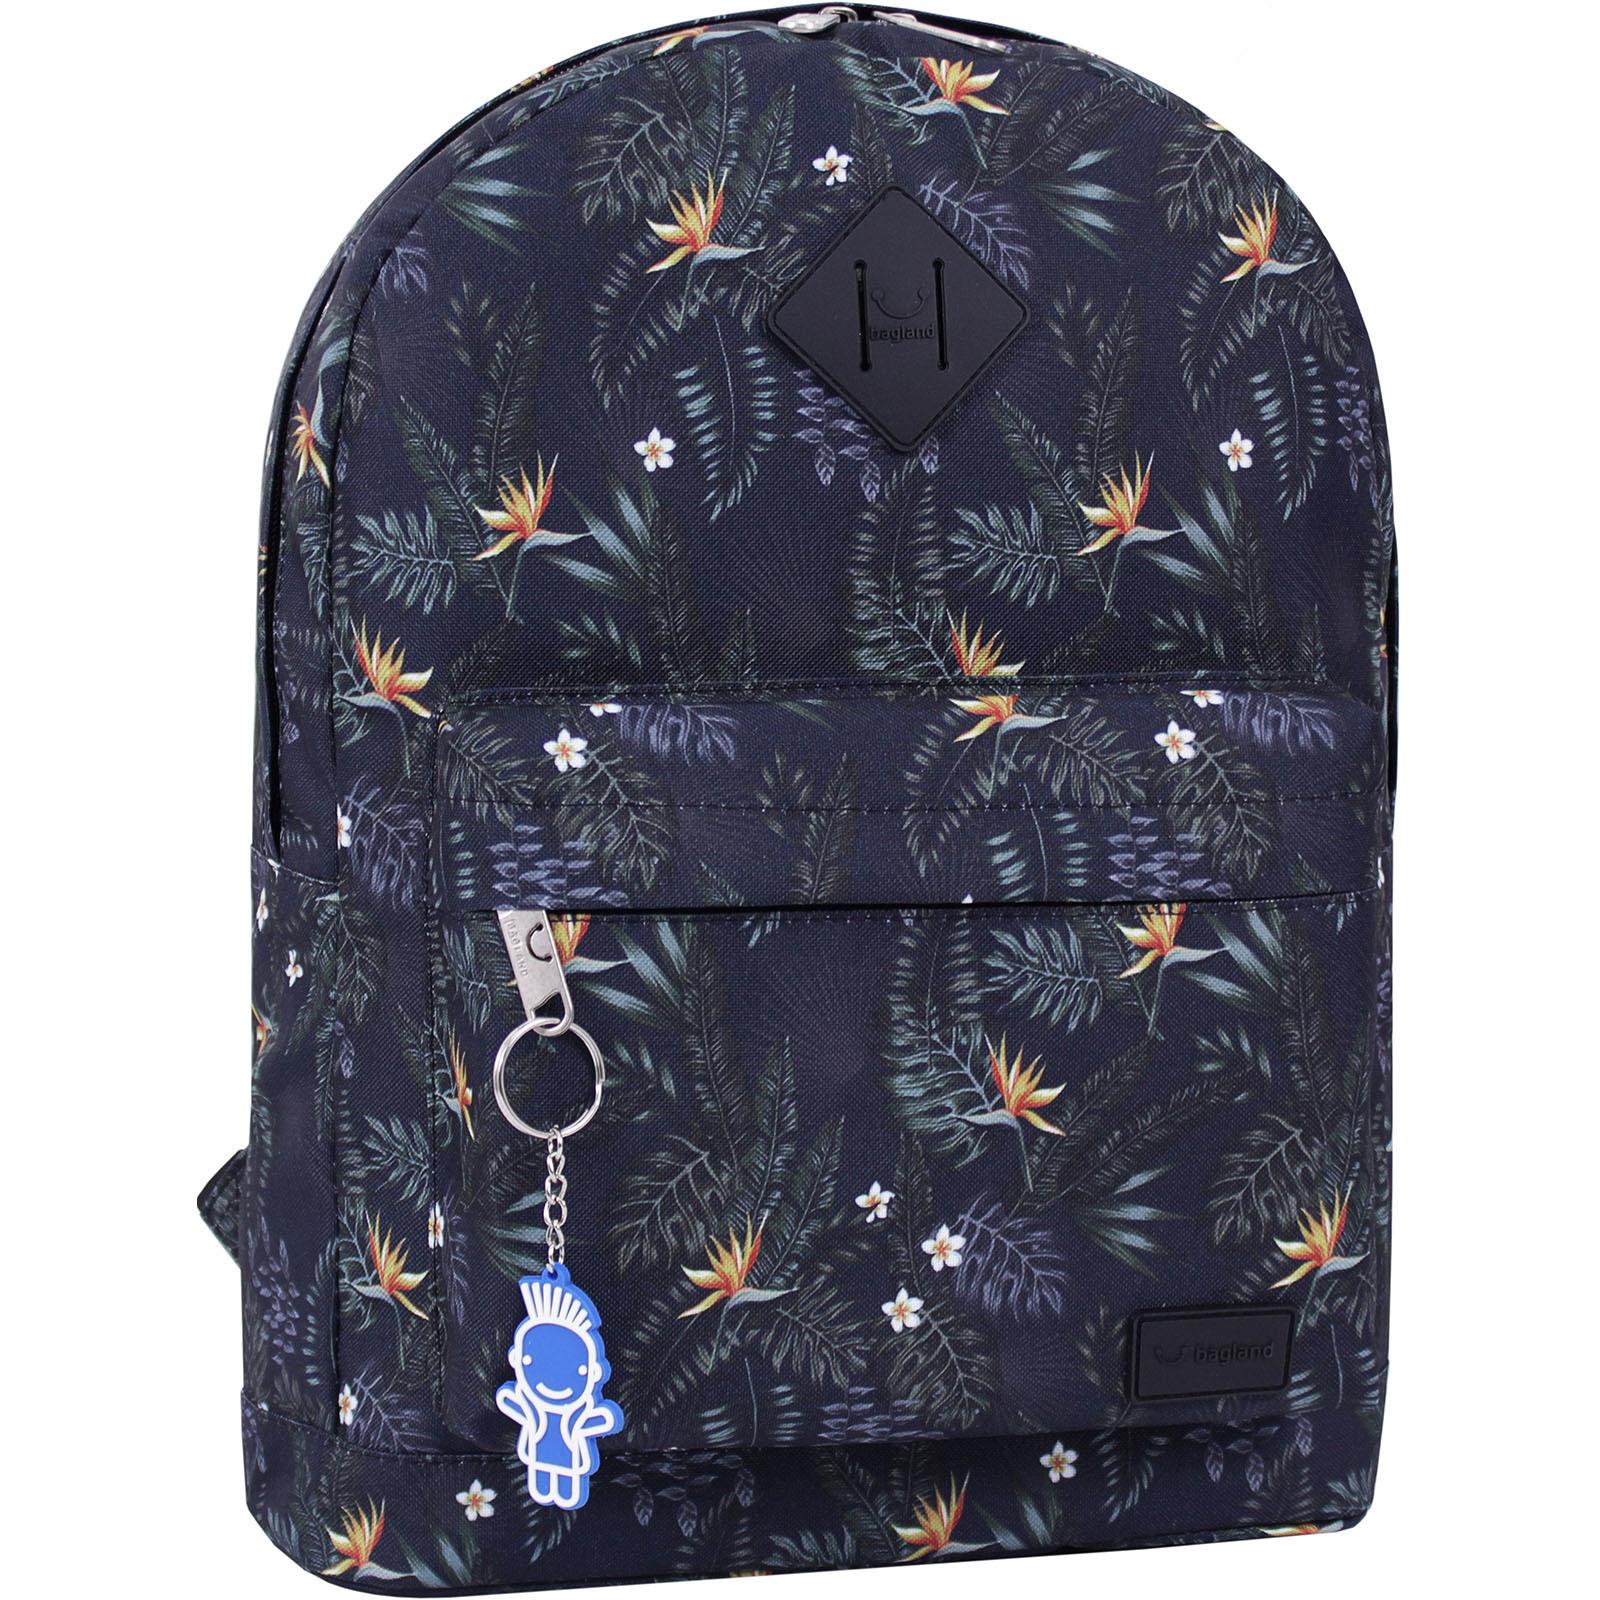 Молодежные рюкзаки Рюкзак Bagland Молодежный 17 л. сублимация 460 (00533664) IMG_9503_суб.460_.JPG